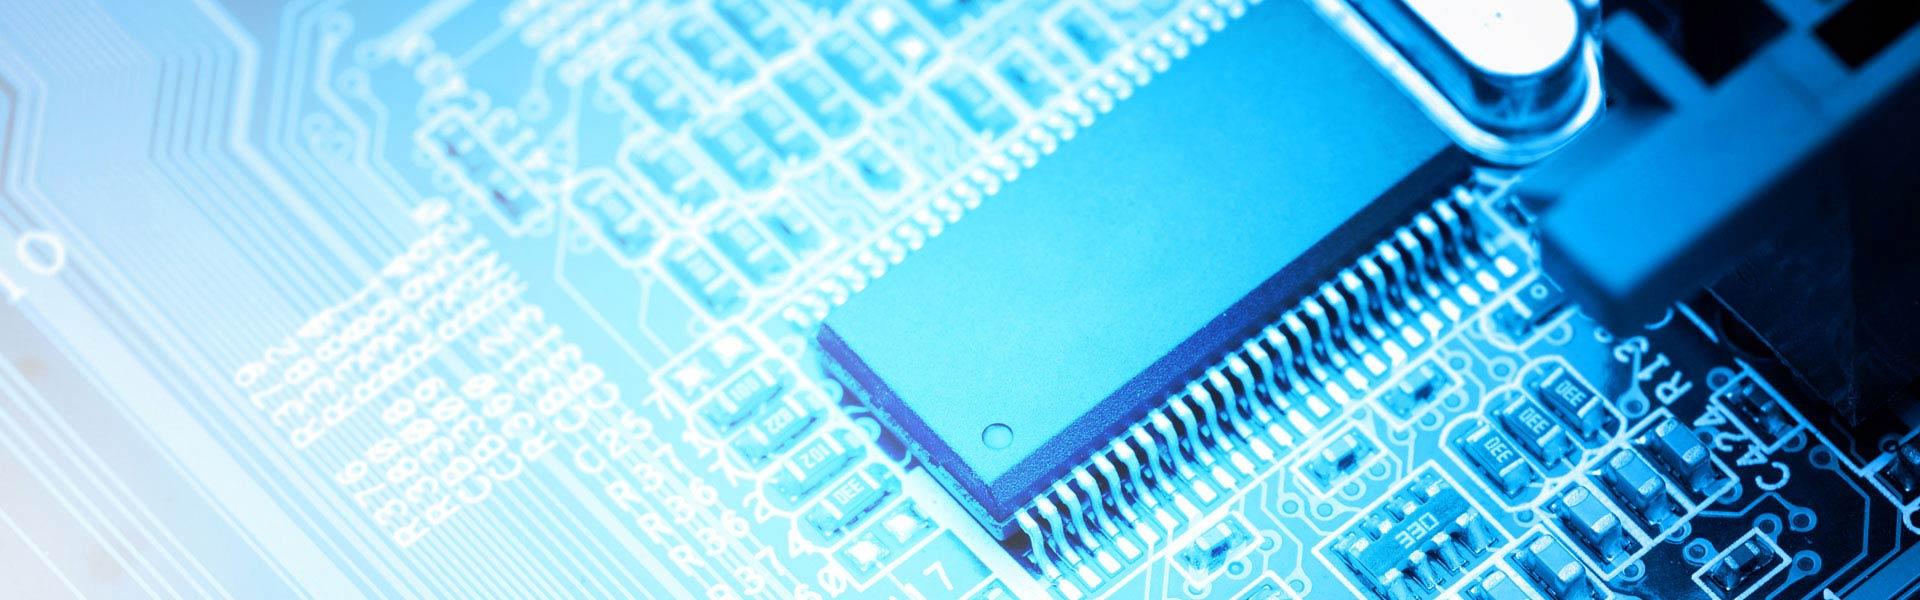 rowe-forschung-research-1920px 关于瑞网 |大幅面彩色打印机|扫描仪|蓝图机|工程机|叠图机|裁切机专家